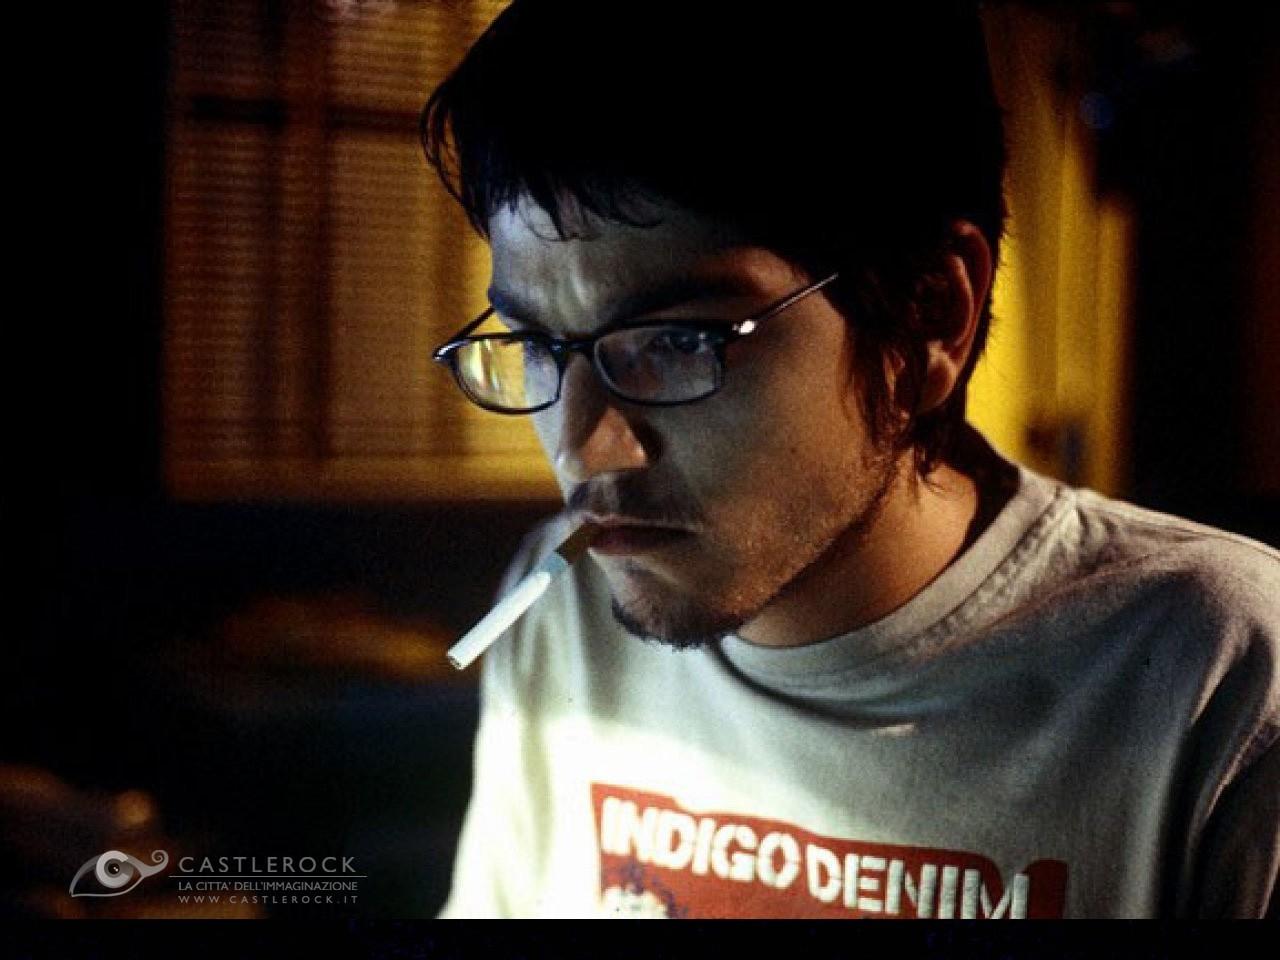 Wallpaper del film Nicotina - La vita senza filtro